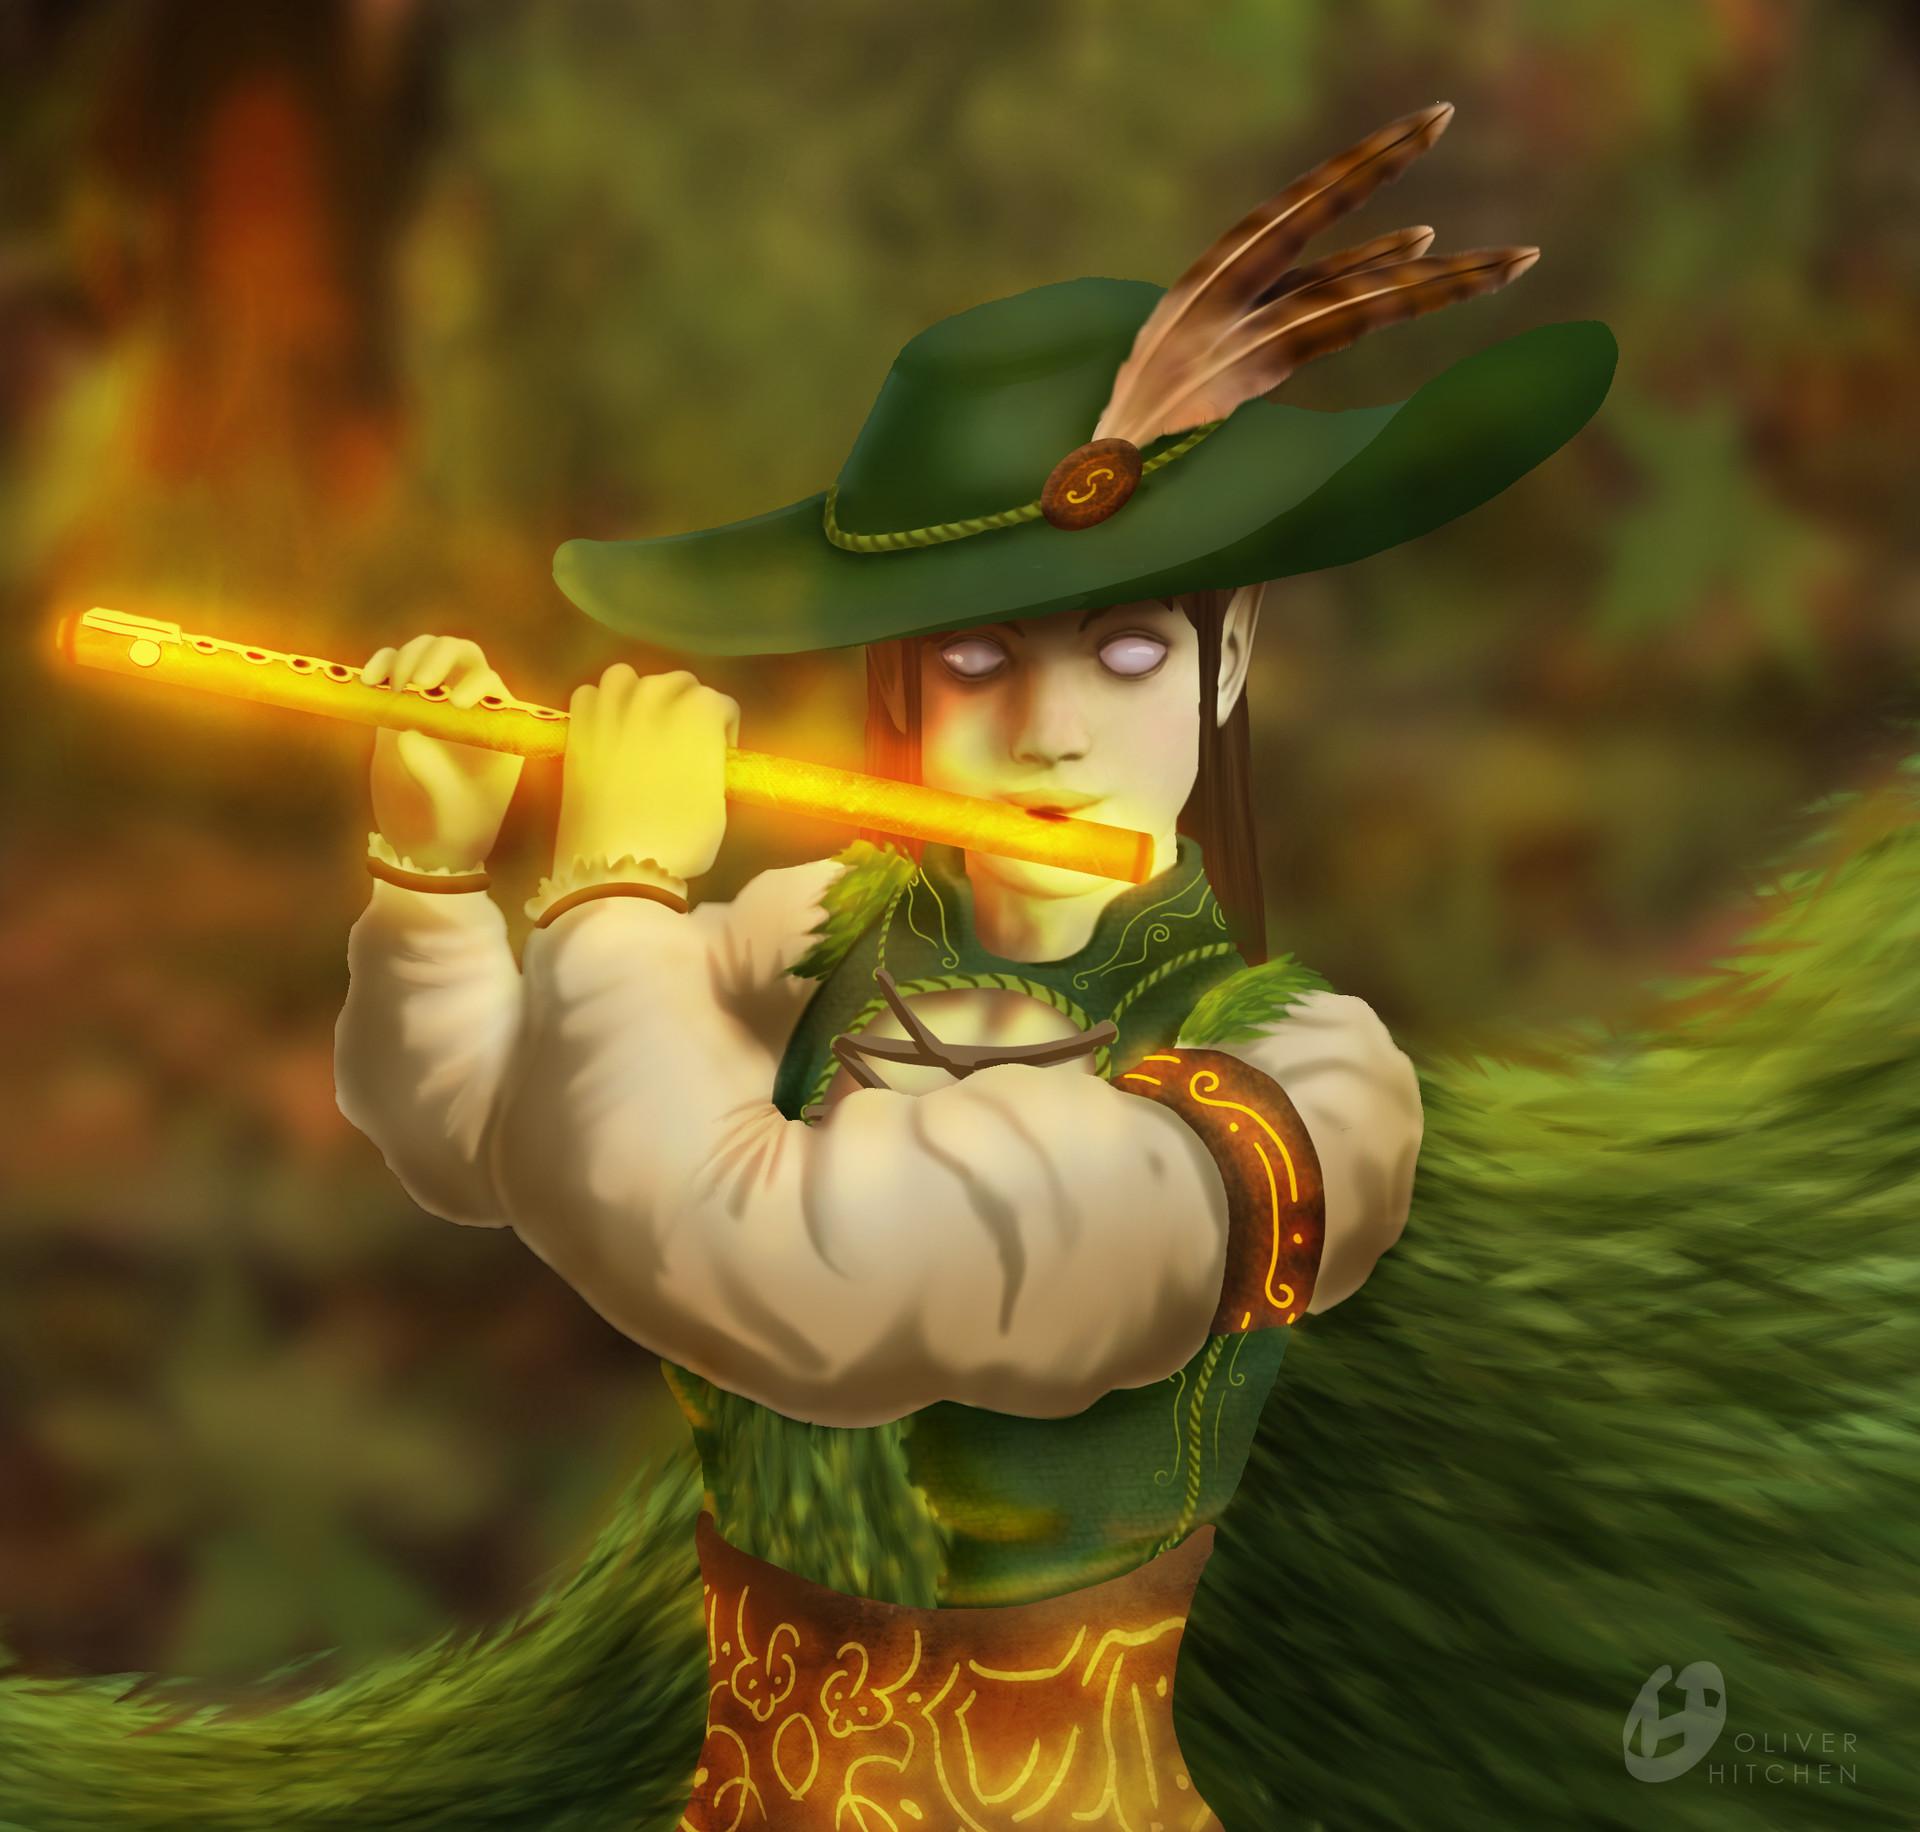 ArtStation - Wood Elf Bard DND Character Commission, Oliver Hitchen